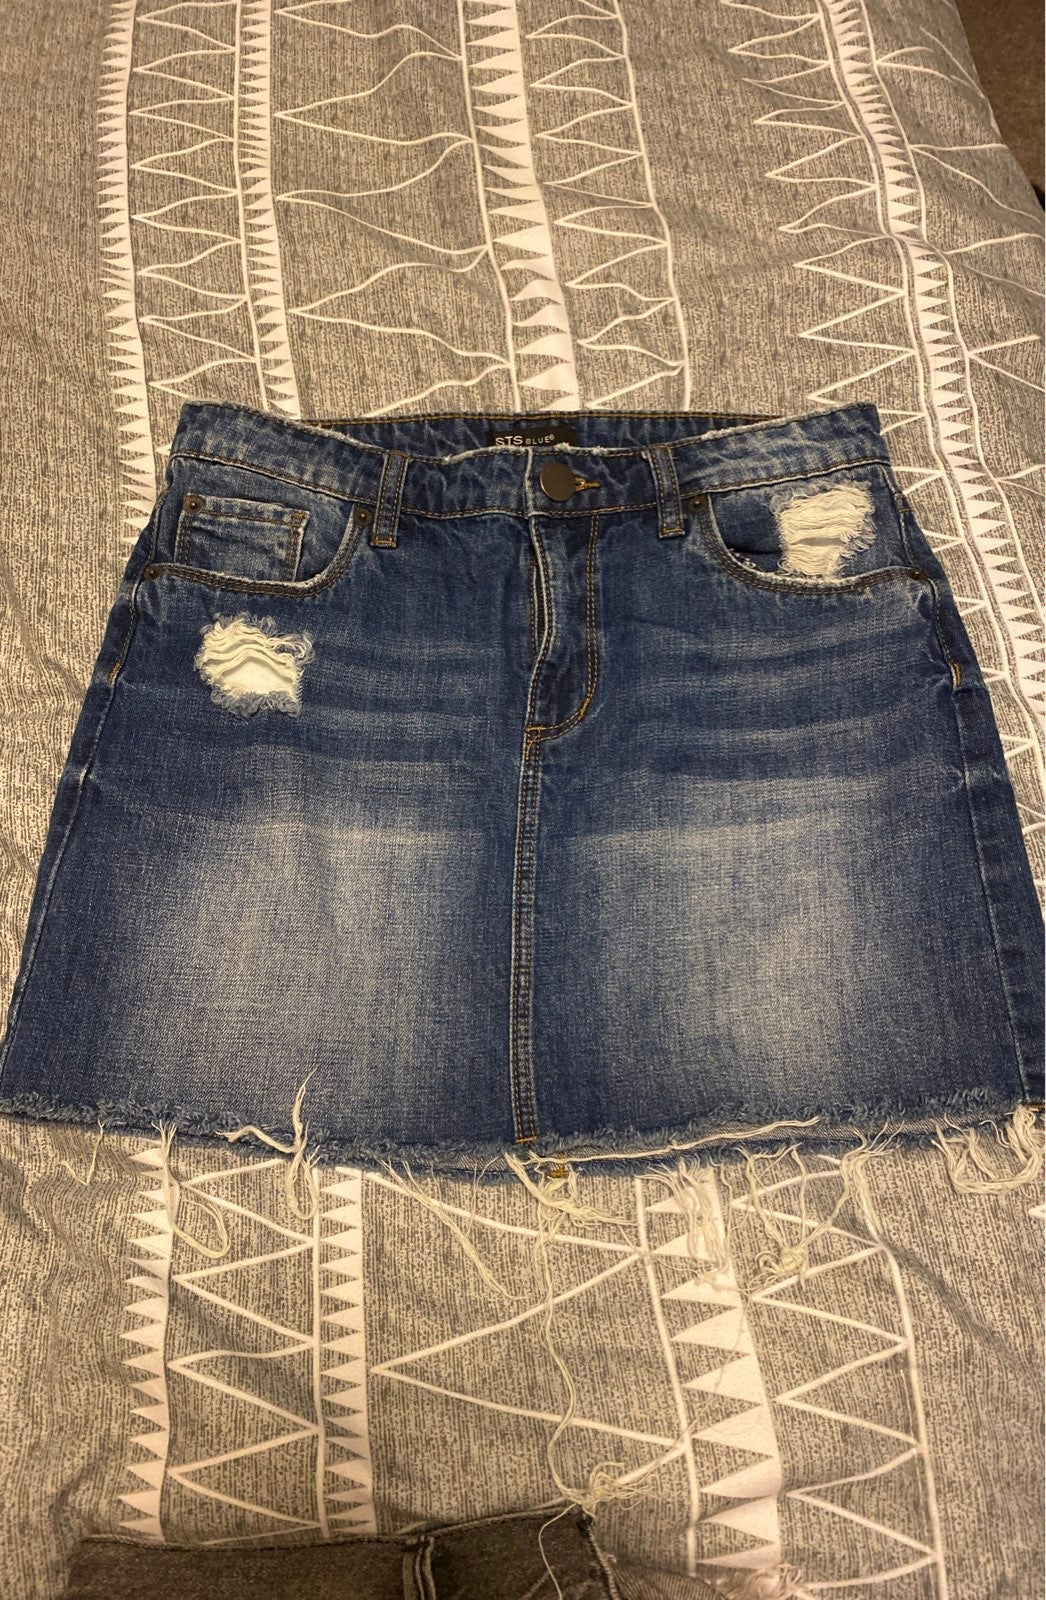 STS Blue Denim Skirt Size 26